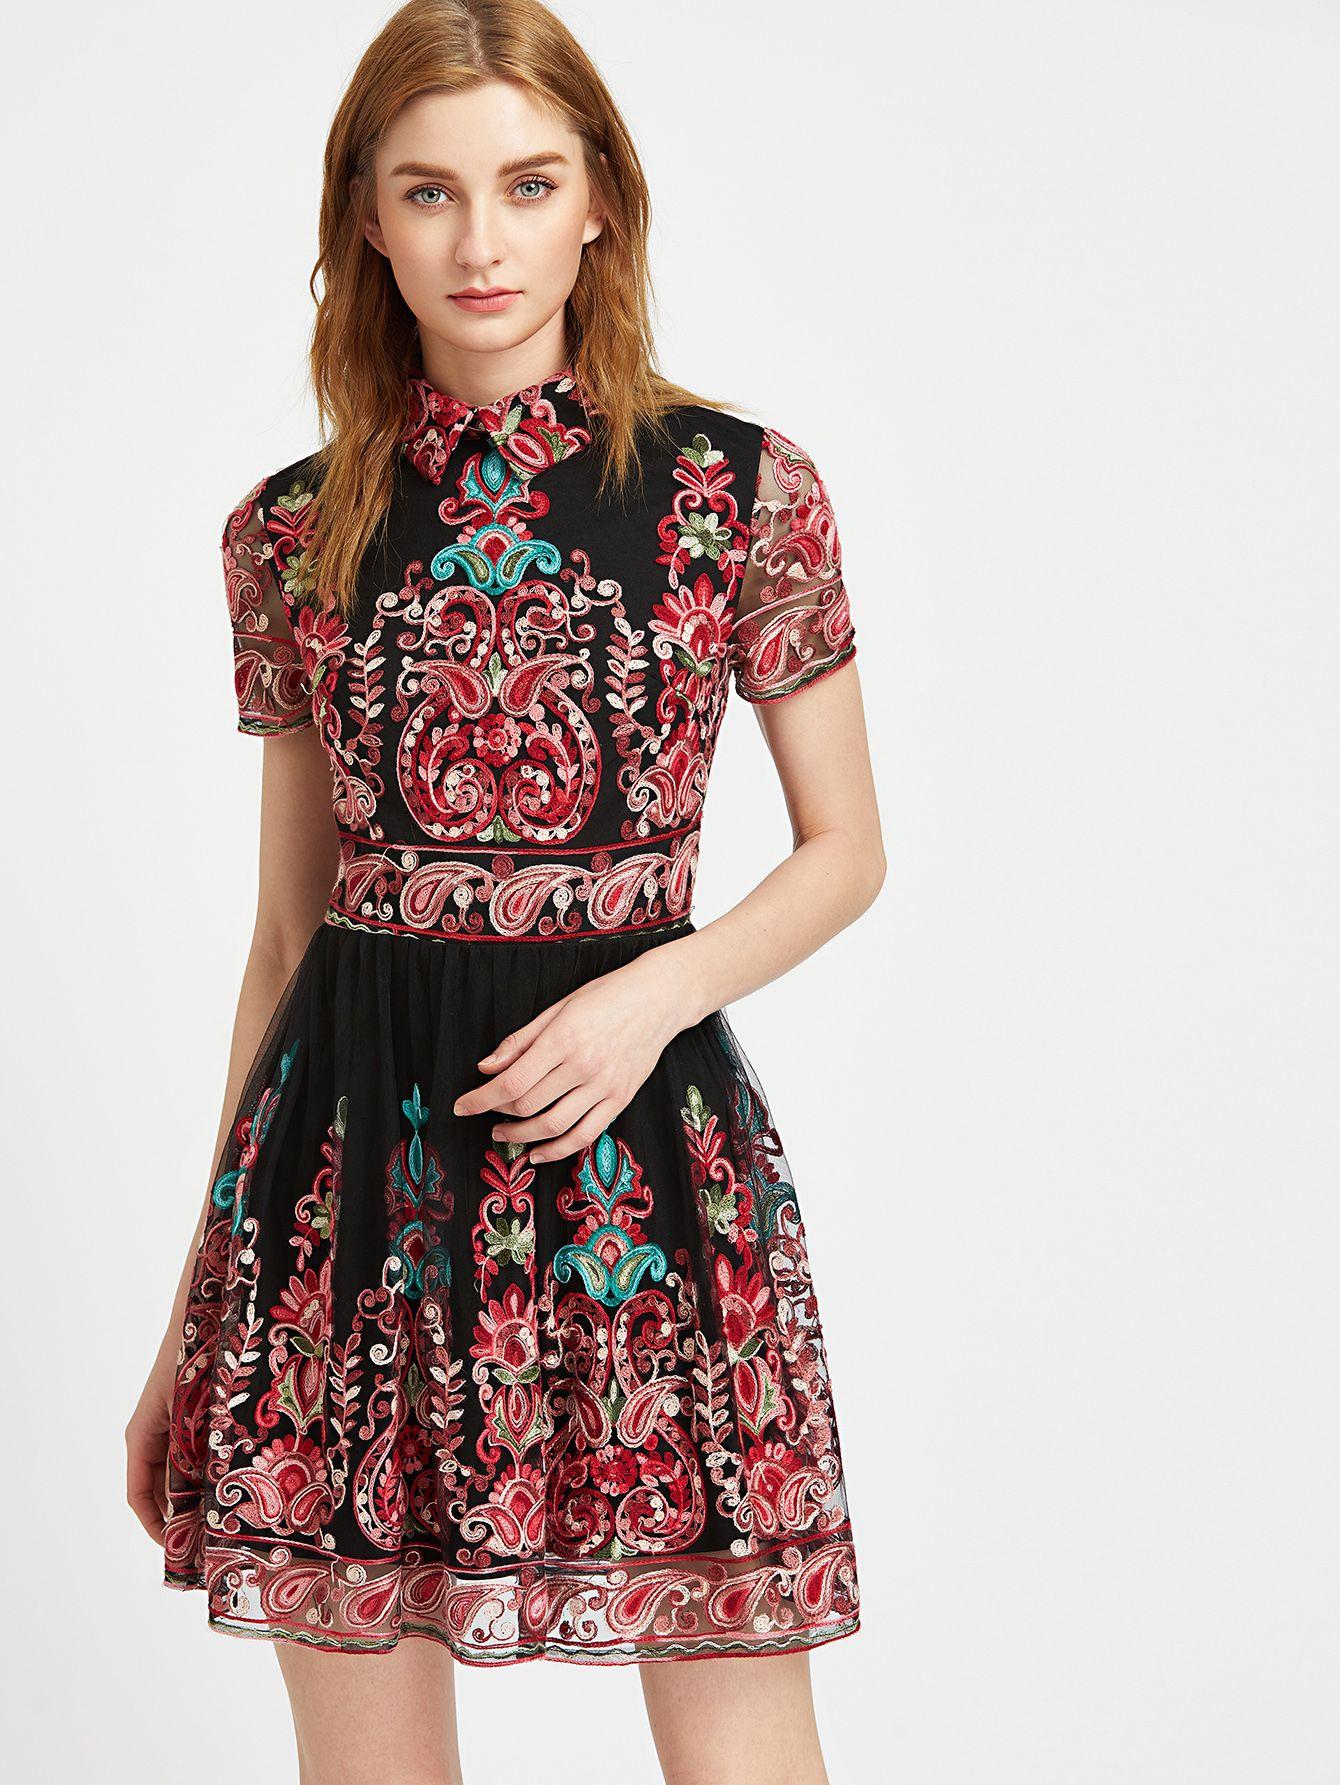 5f6ceef054 Embroidered Mesh Overlay Skater Dress -SheIn(Sheinside)